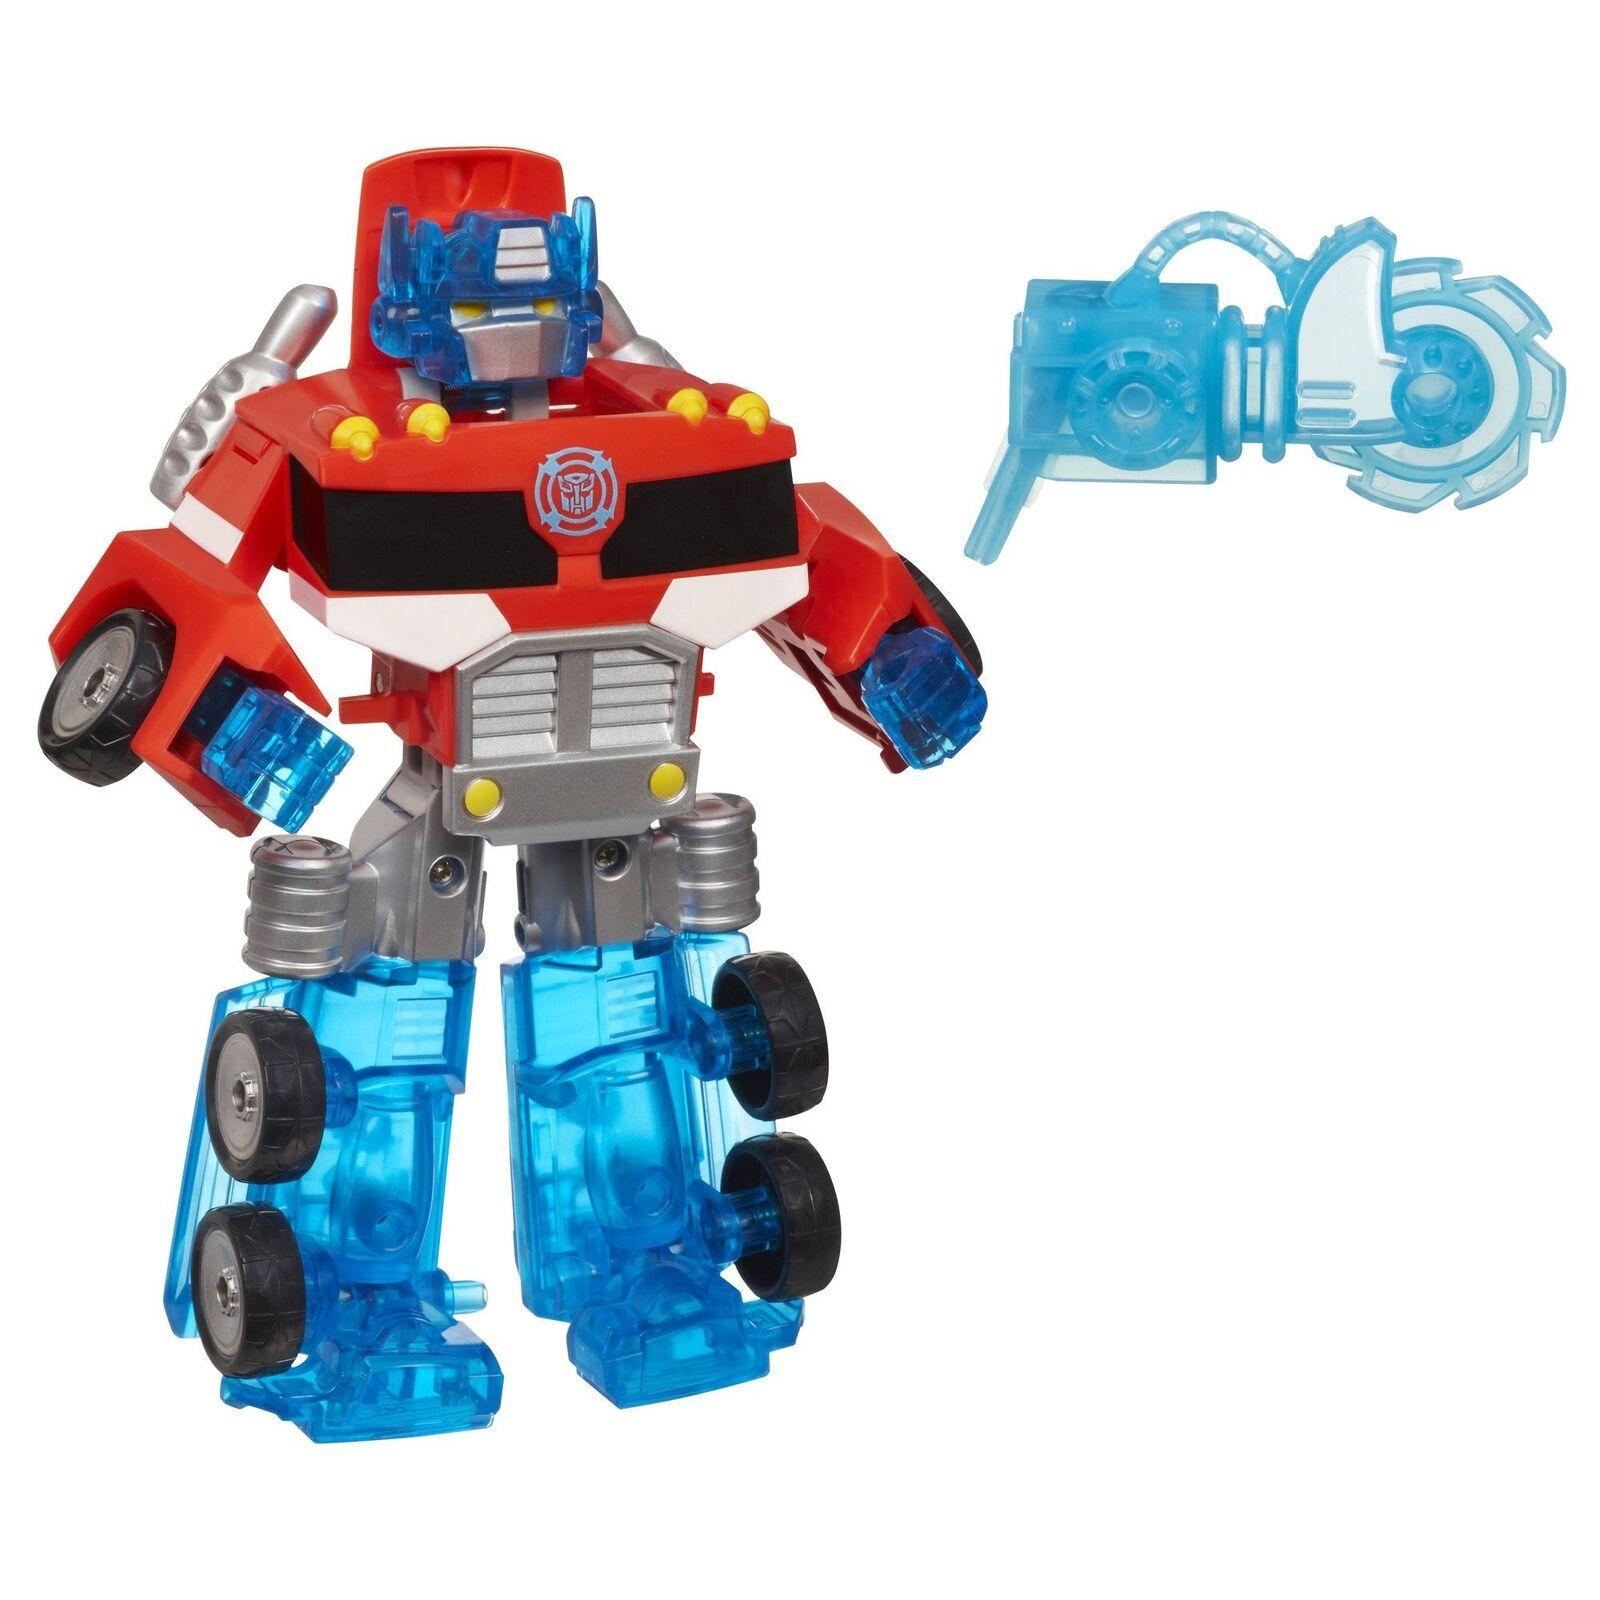 Transformers Playskool Heroes Rescue Bots Energize Optimus Prime Action Figure,